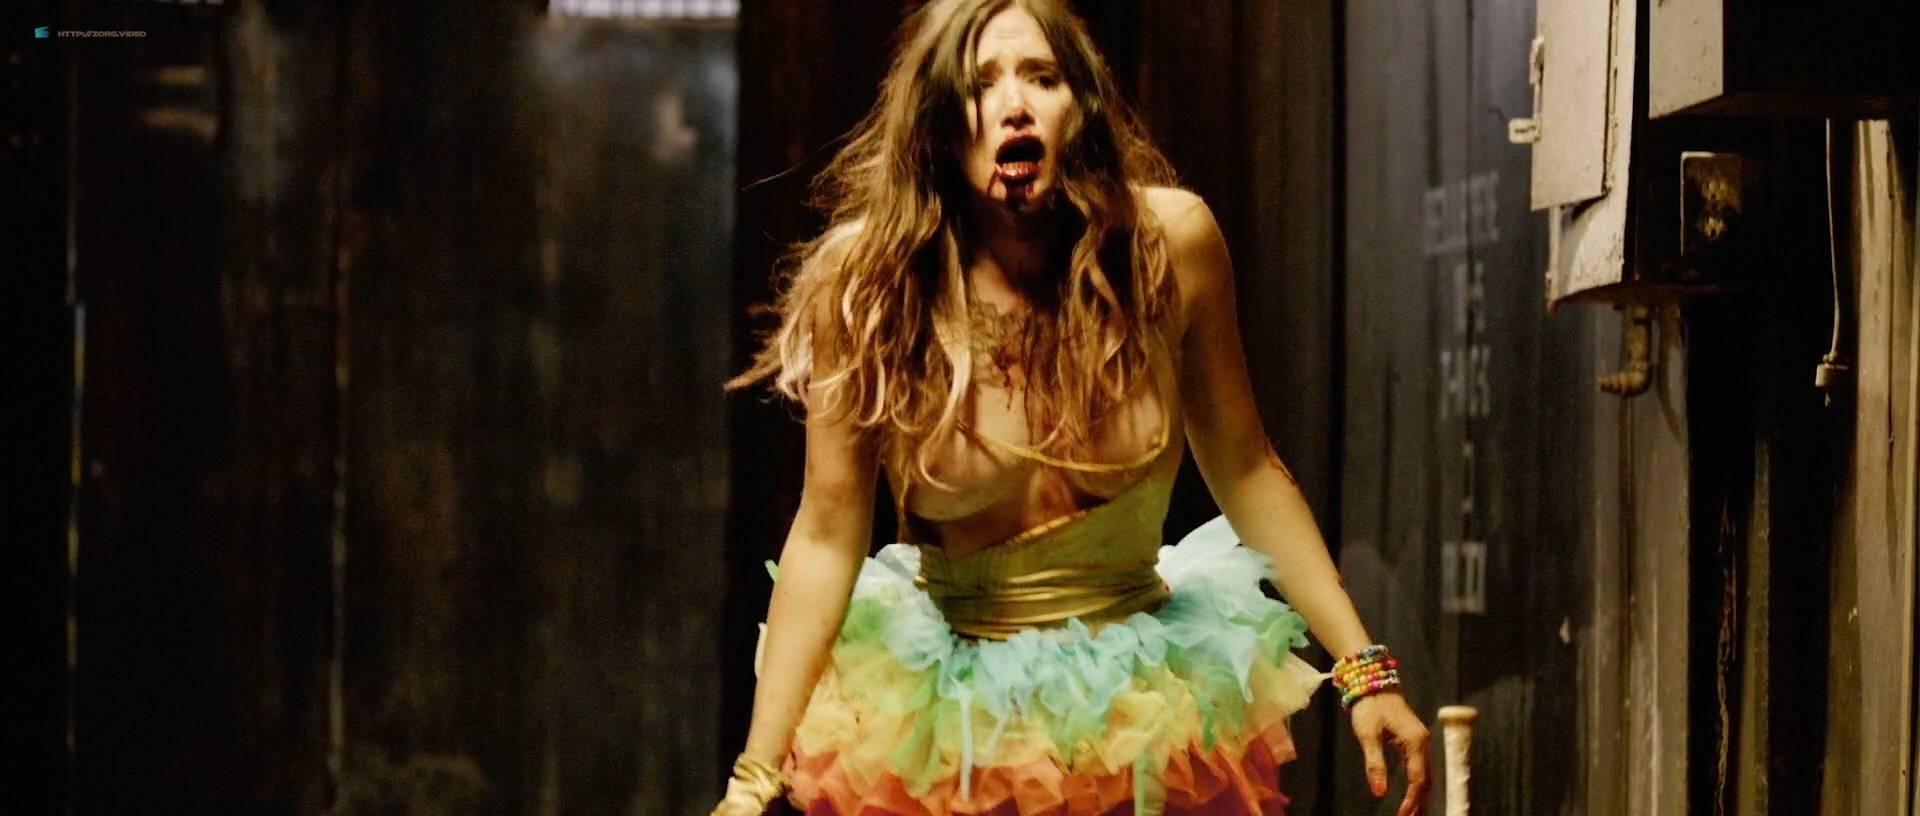 Sara-Malakul-Lane-nude-toples-Kelly-McCart-and-Amanda-Ruth-Ritchie-nude-too-Halloween-Pussy-Trap-Kill-Kill-2017-HD-1080p-Web-016.jpg